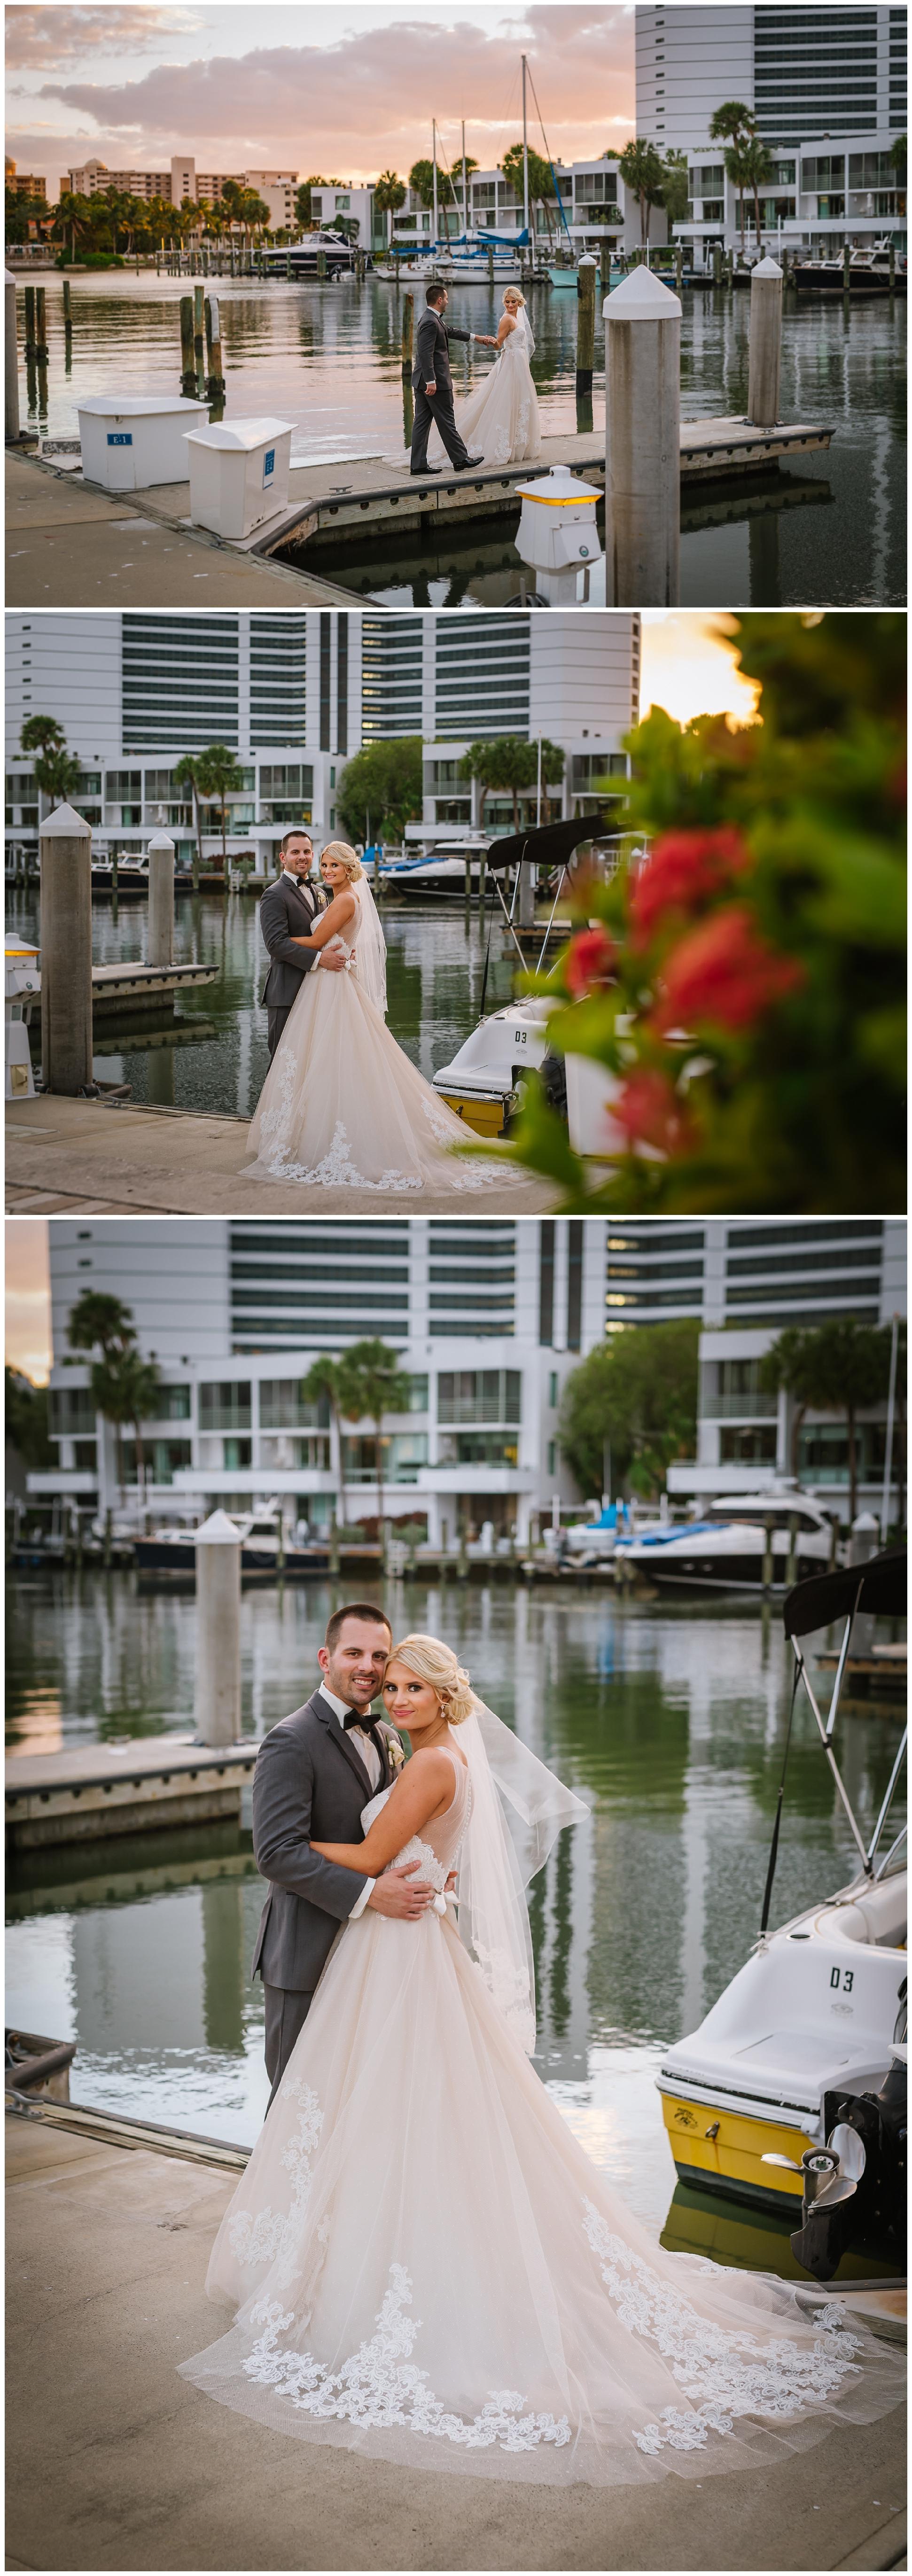 Sarasota-wedding-photographer-hyatt-regency-blush_0050.jpg